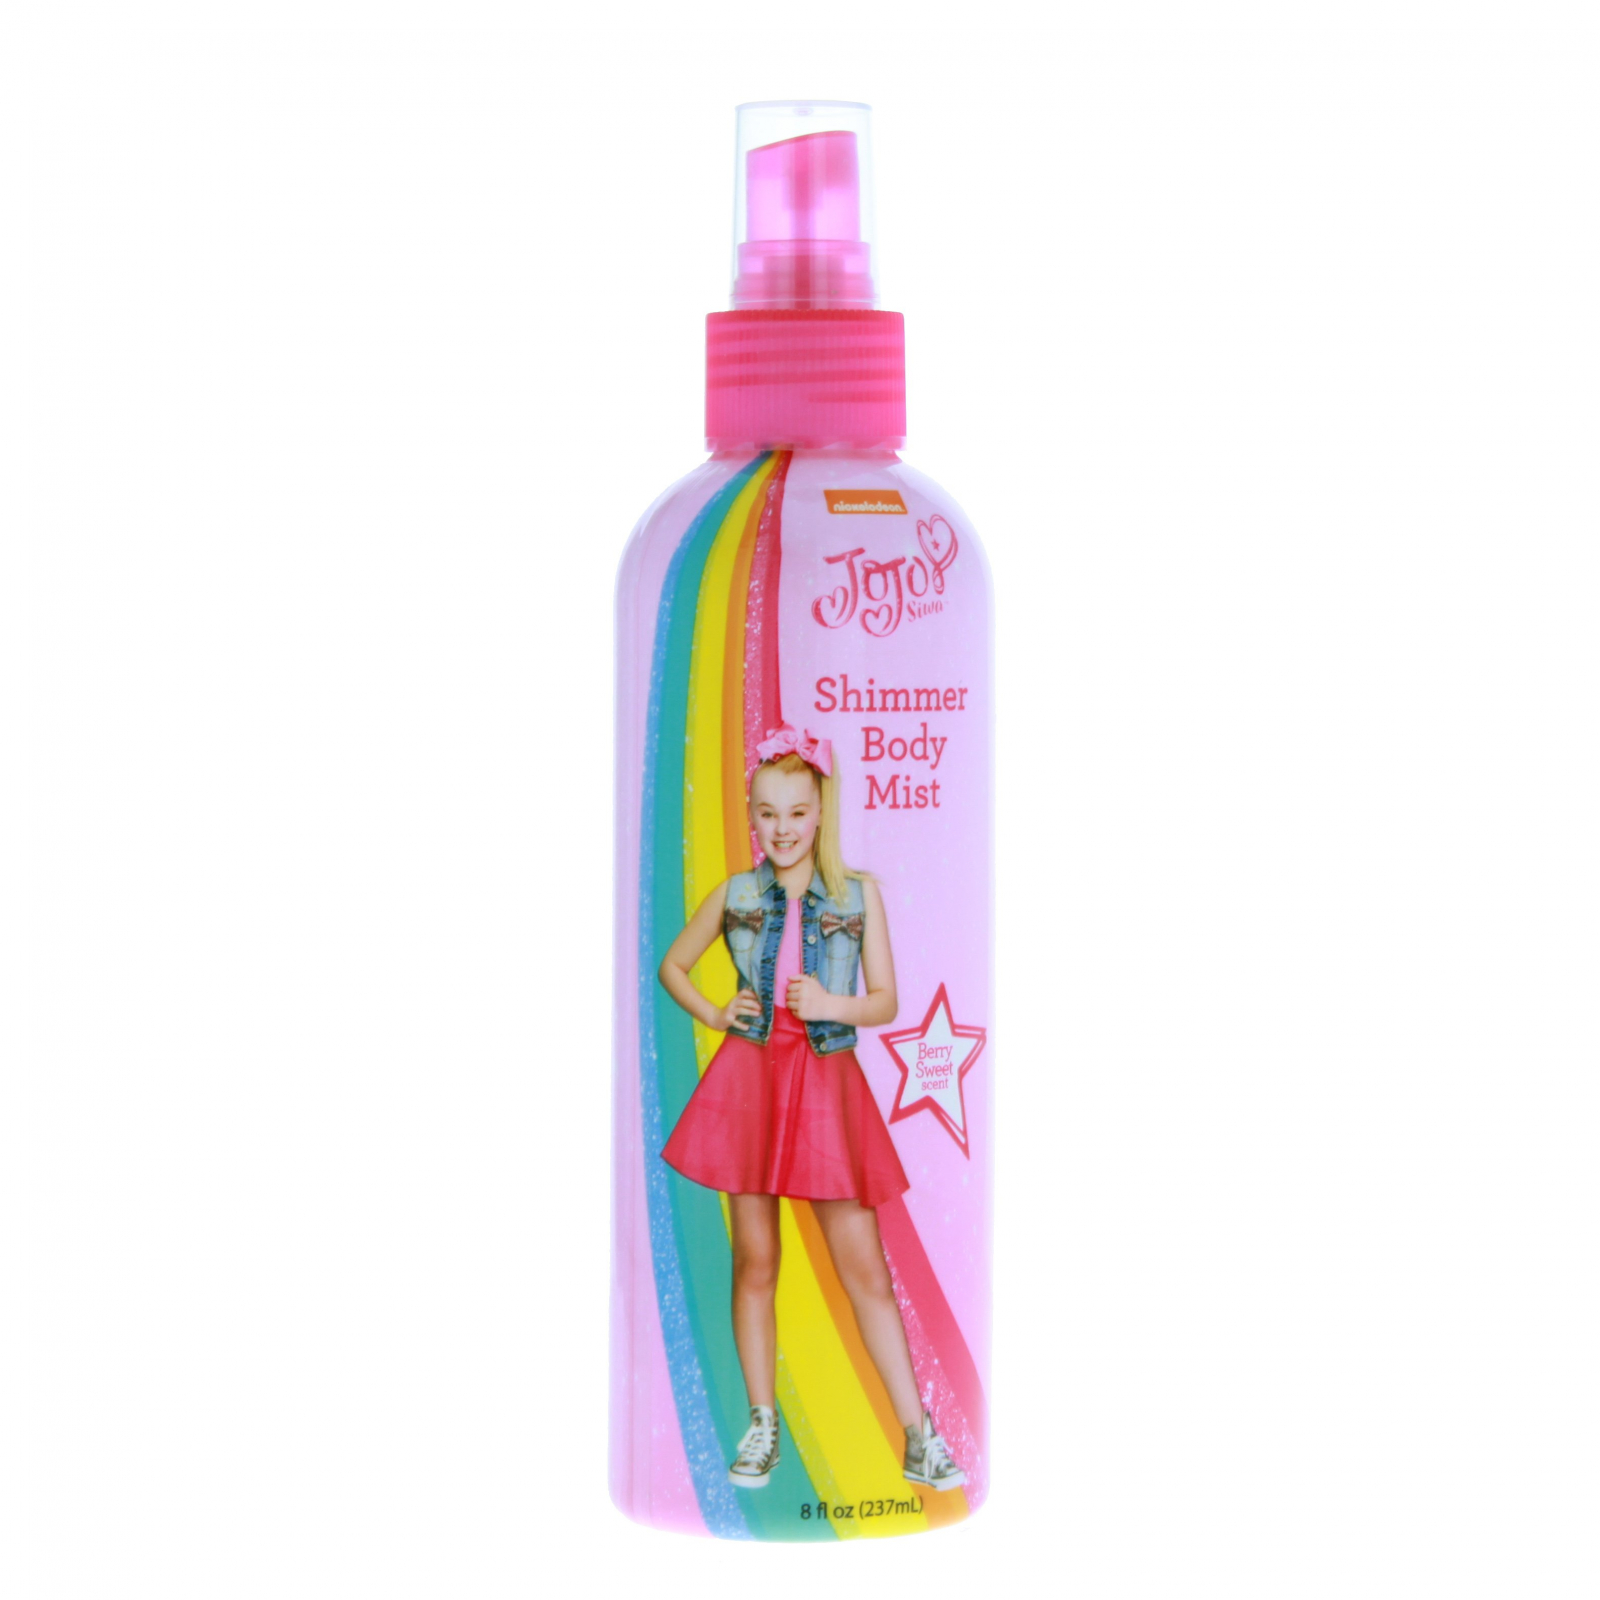 Nickelodeon JoJo Siwa Girls Shimmer Body Mist 6 Ounce Bottle